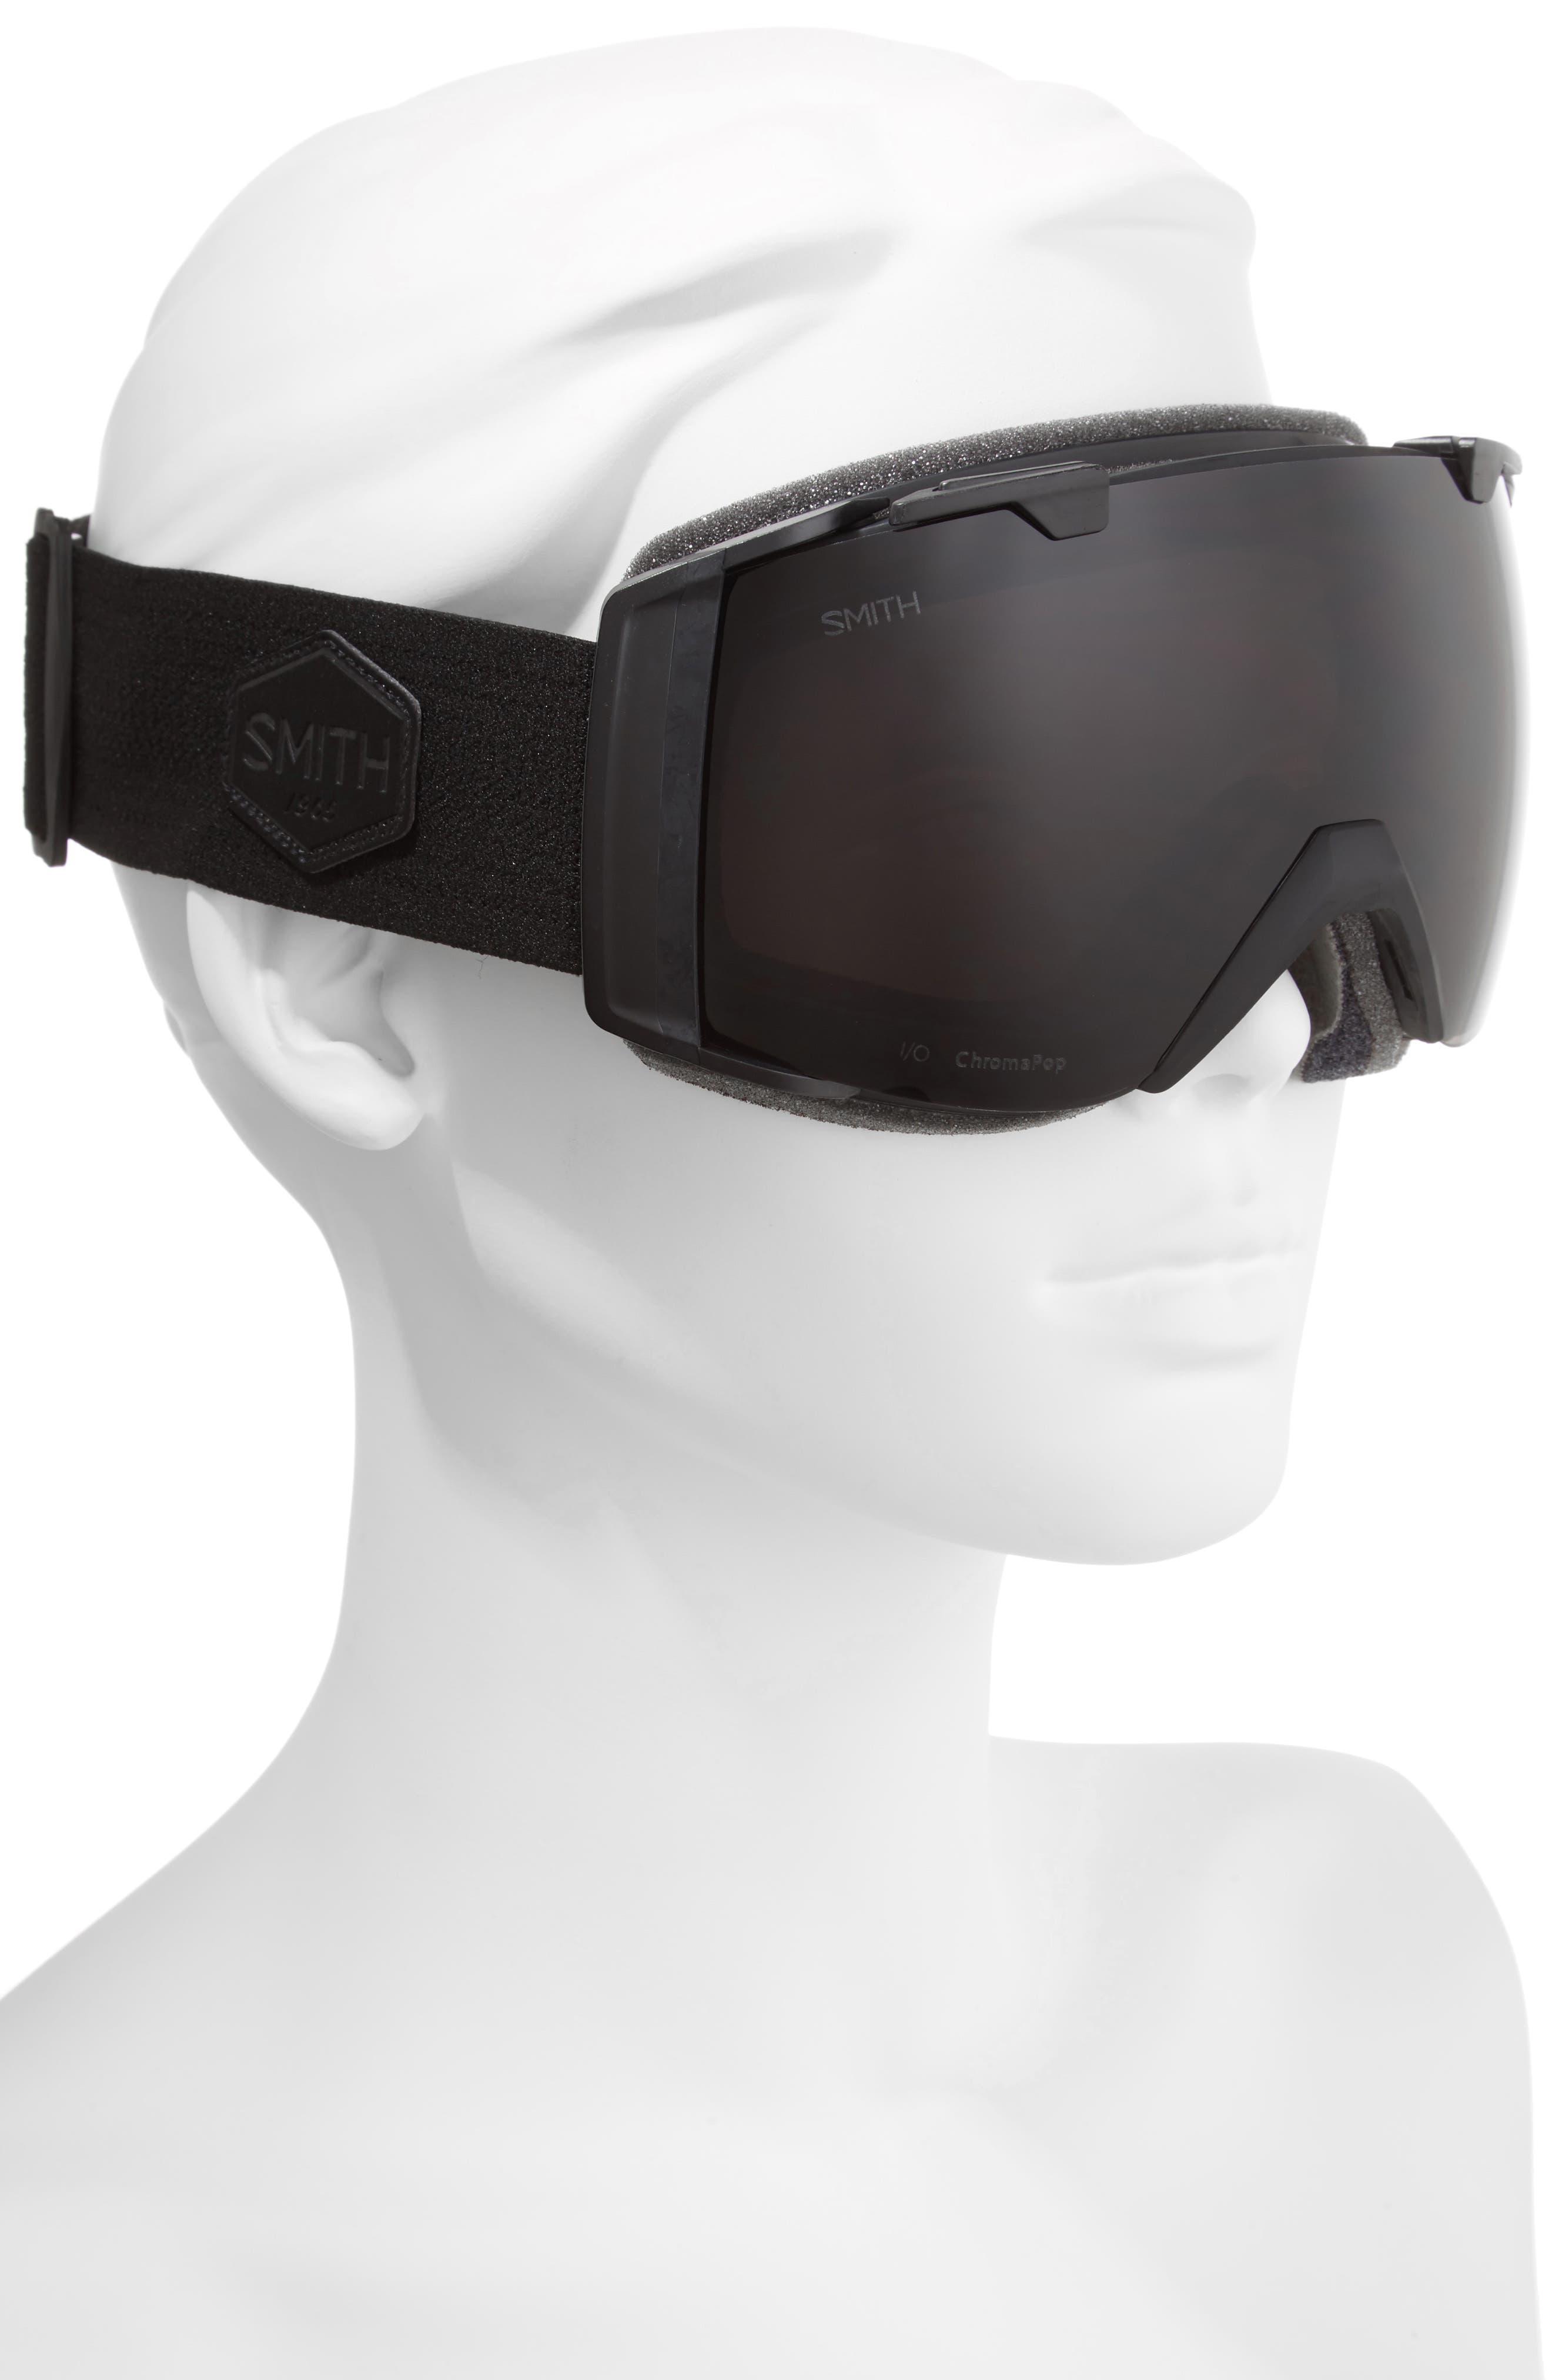 I/O 185mm Snow/Ski Goggles,                             Alternate thumbnail 2, color,                             BLACKOUT/ MIRROR